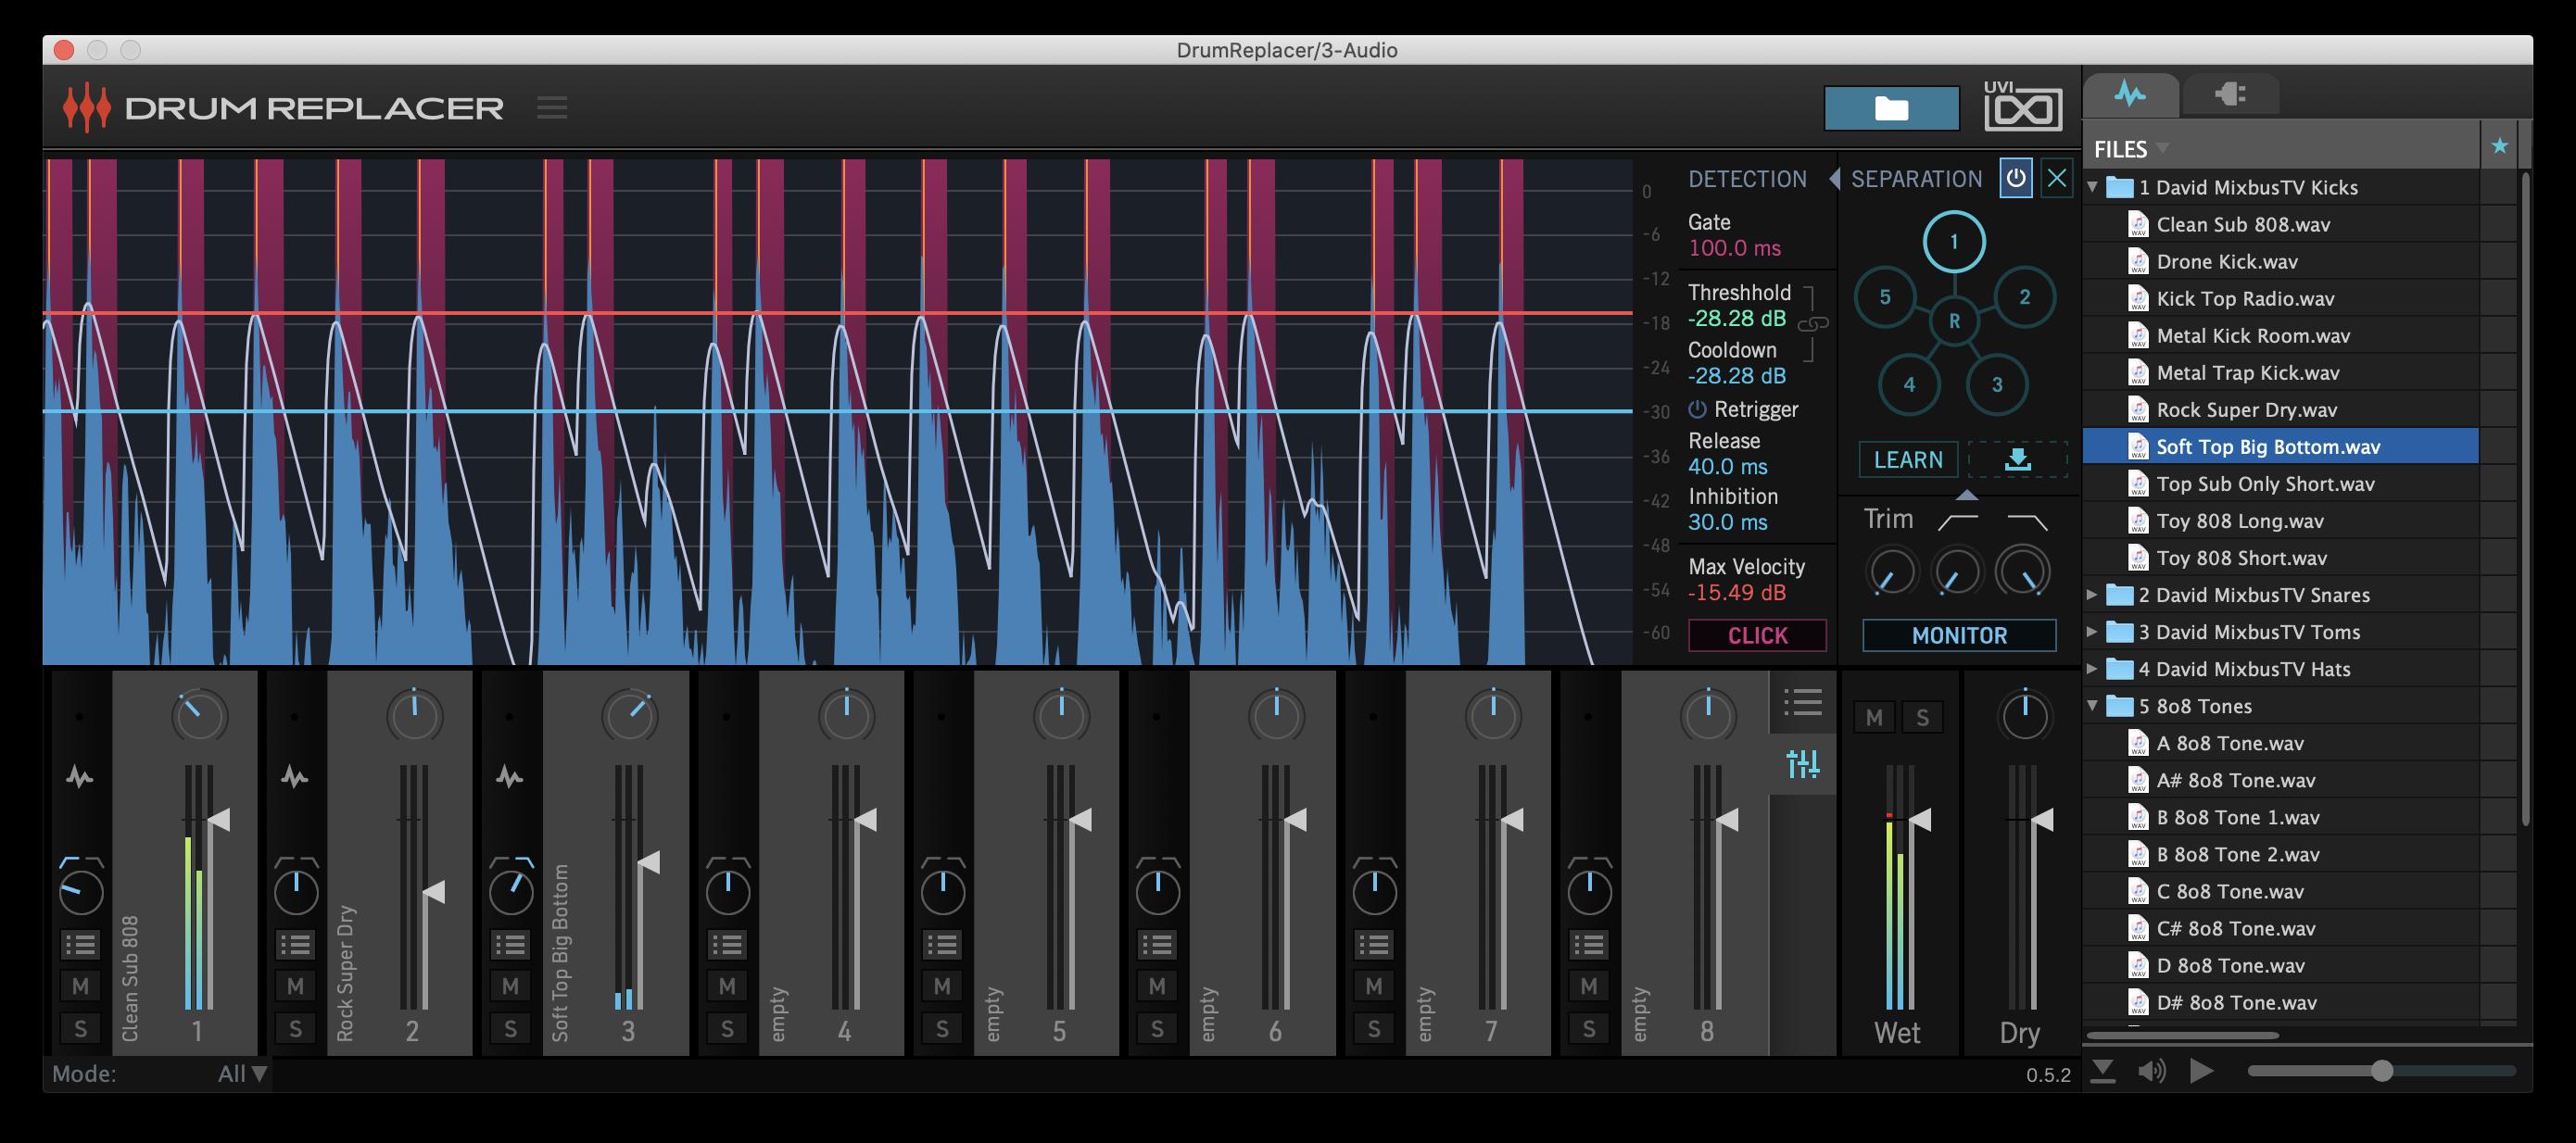 Drum Replacer Mixer GUI